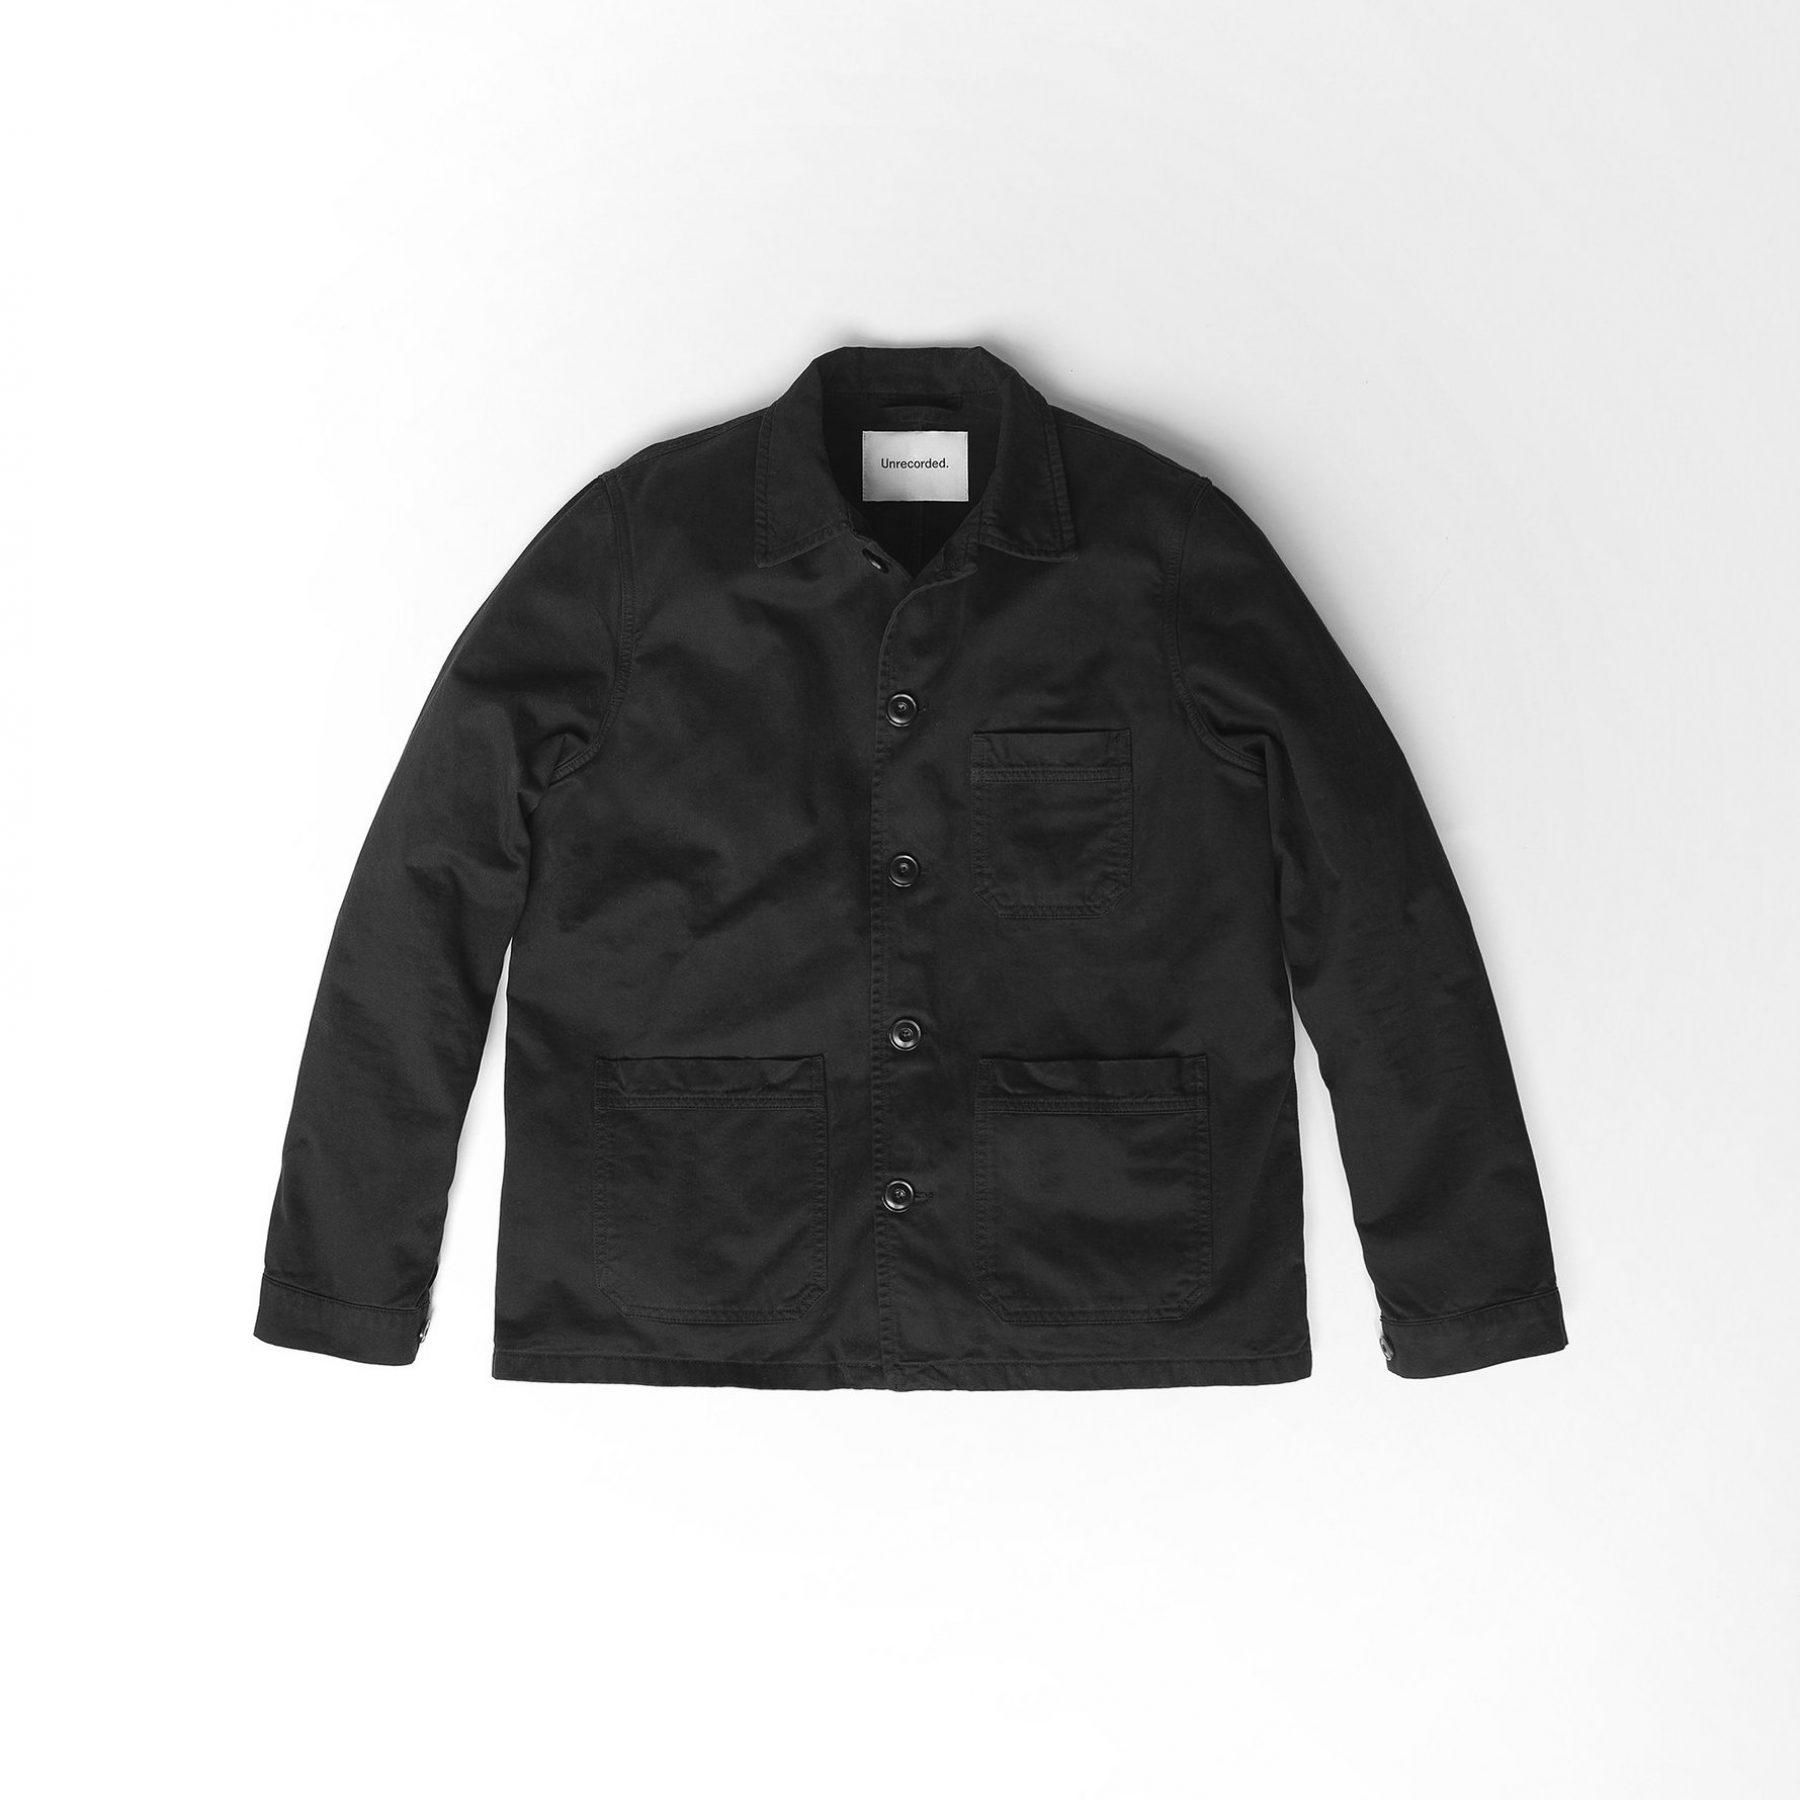 Unrecorded-Worker-Jacket-1